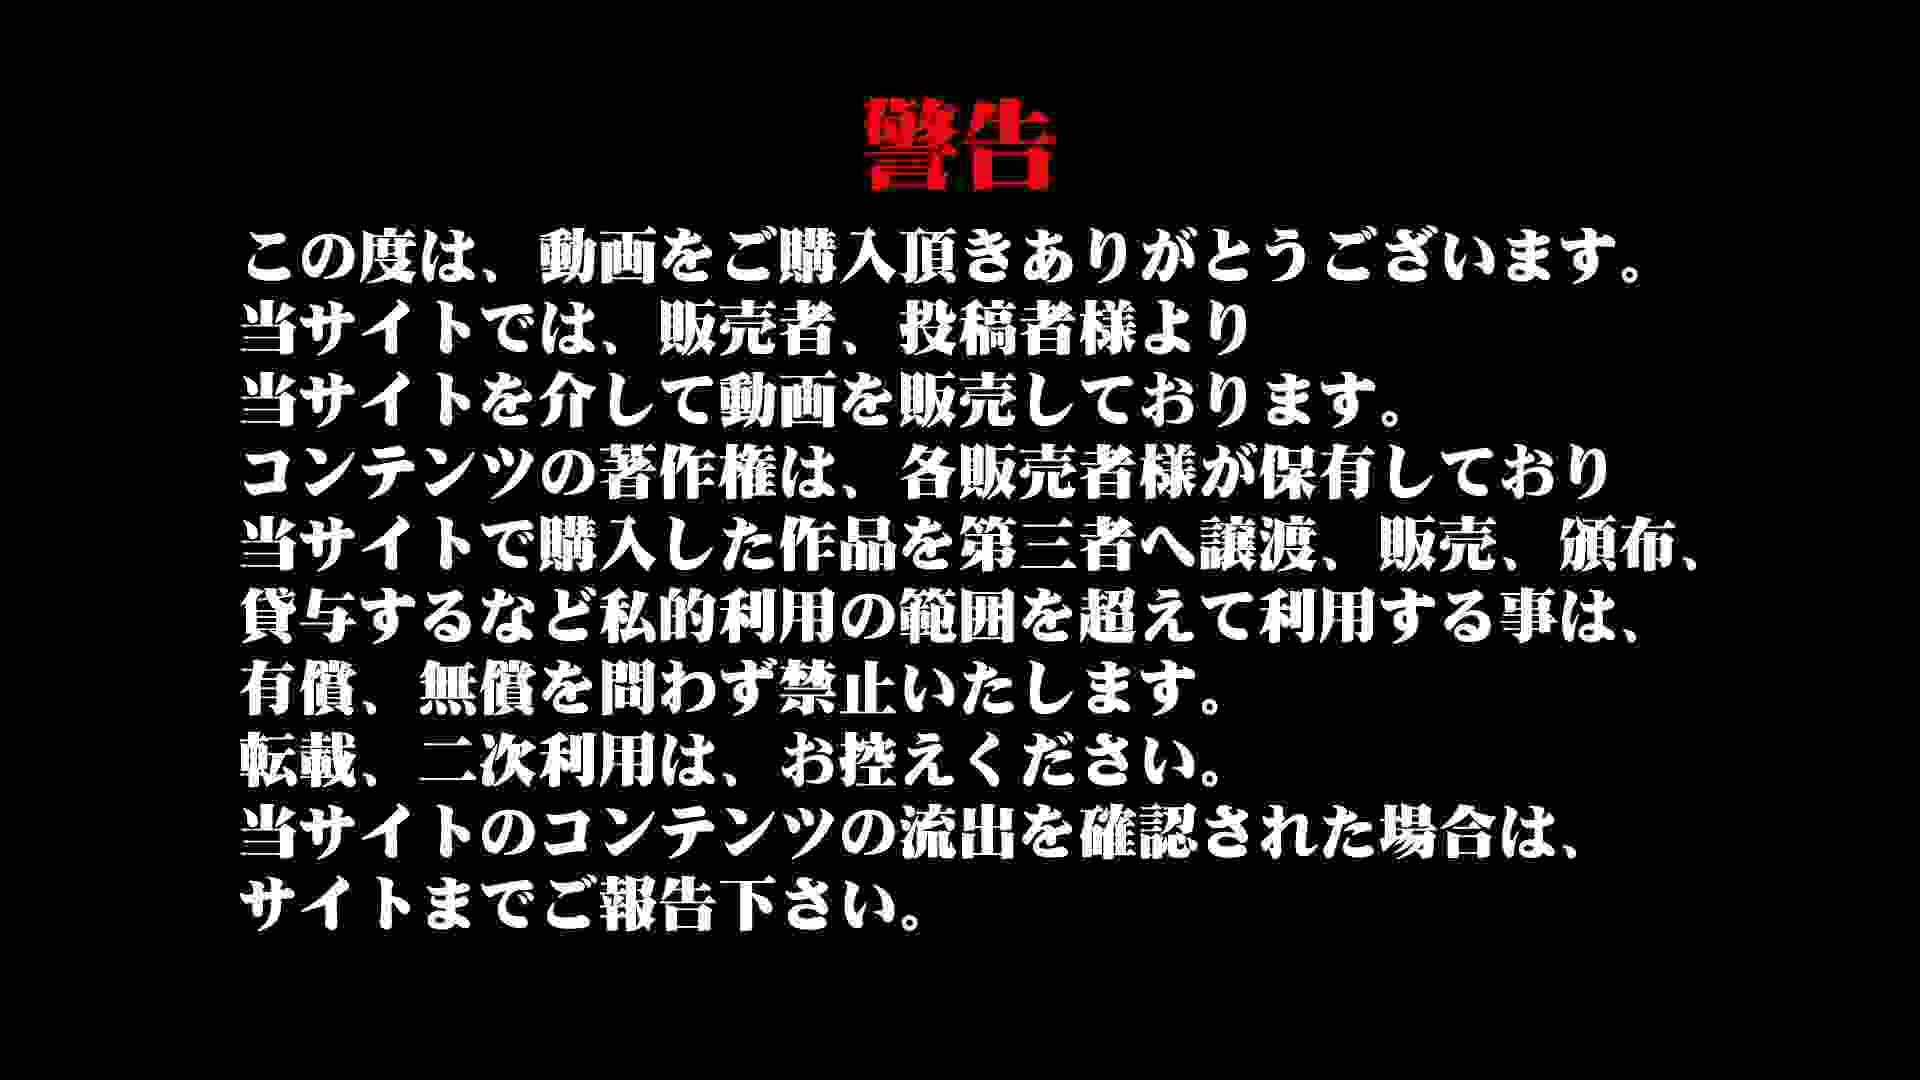 Aquaな露天風呂Vol.889 盗撮シリーズ | 露天風呂編  89PIX 1